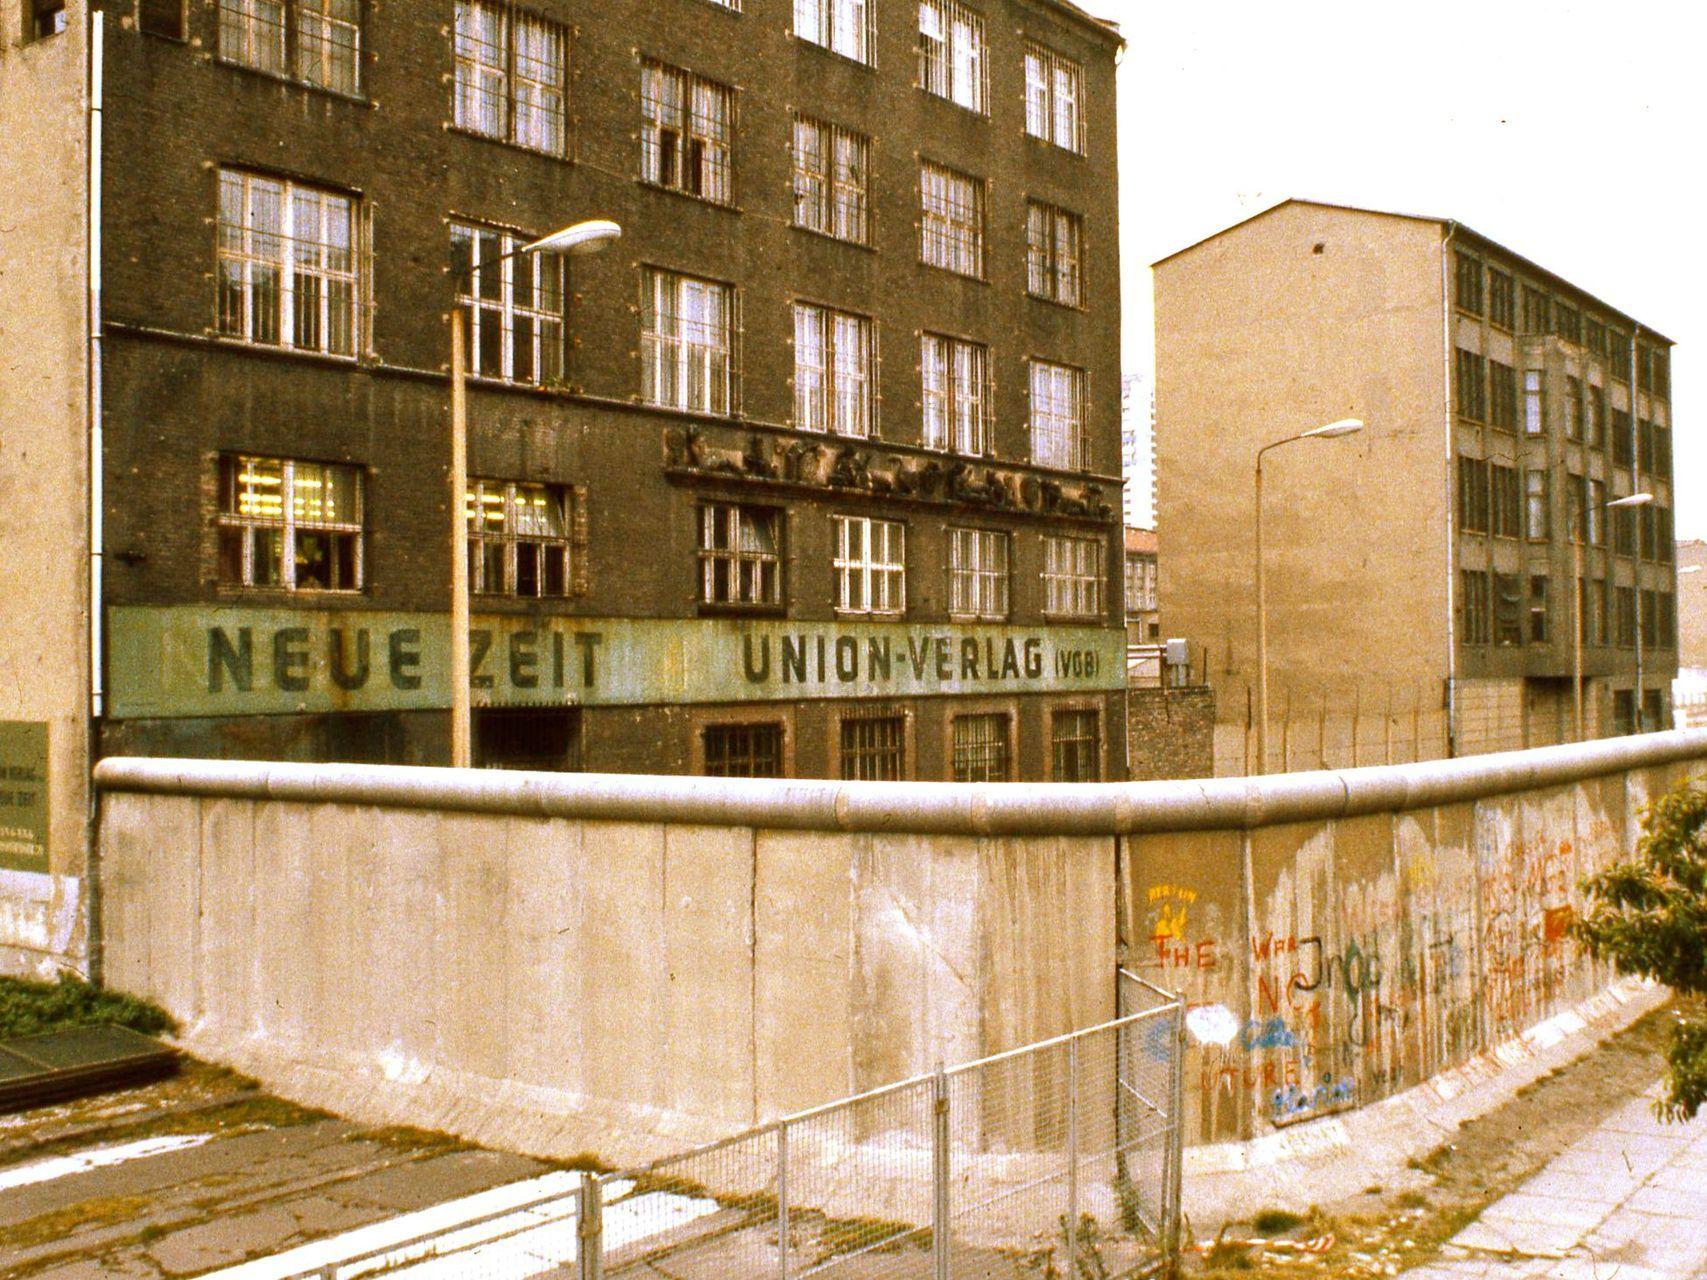 Cinestar Frankfurt Griesheim Programm